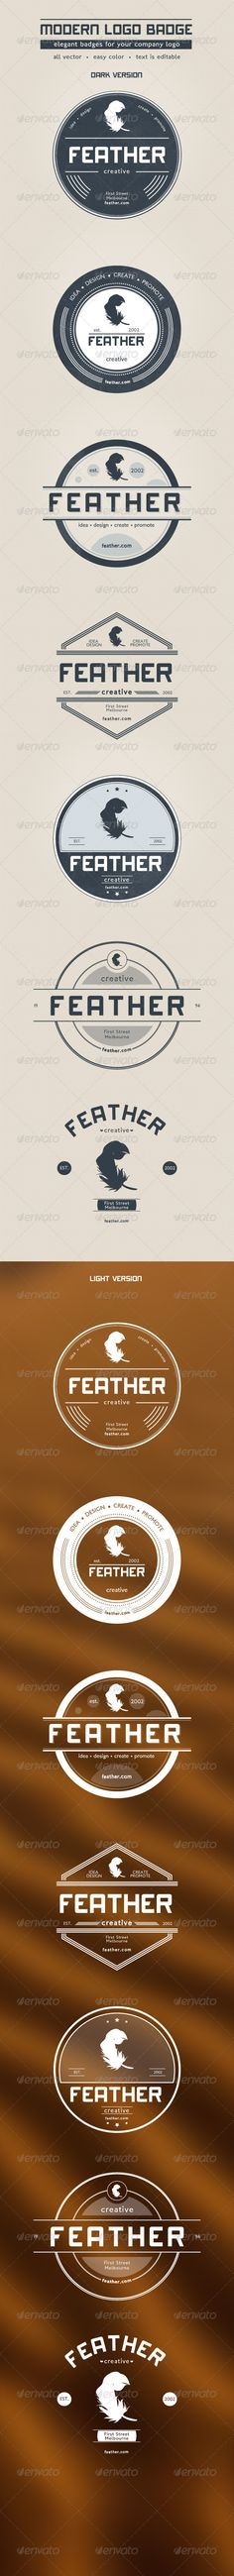 Modern Logo Badge  #dark #eps #label • Available here → http://graphicriver.net/item/modern-logo-badge/1042978?s_rank=1282&ref=pxcr